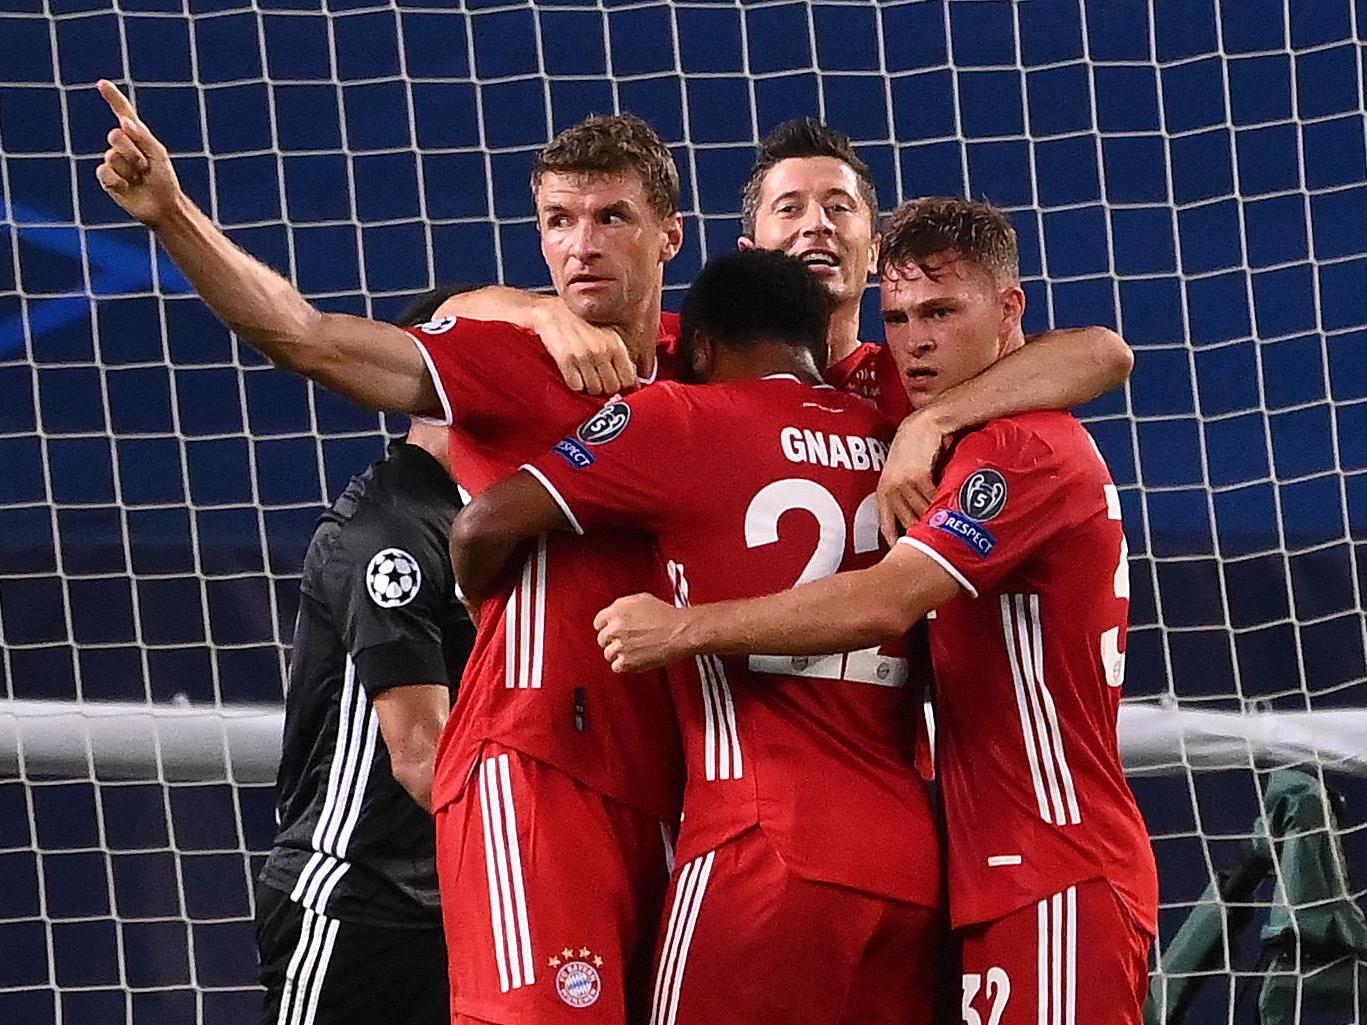 Uefa Champions League Bayern Munich Vs Lyon Live Score Updates 2 0 In 2nd Half Glbnews Com